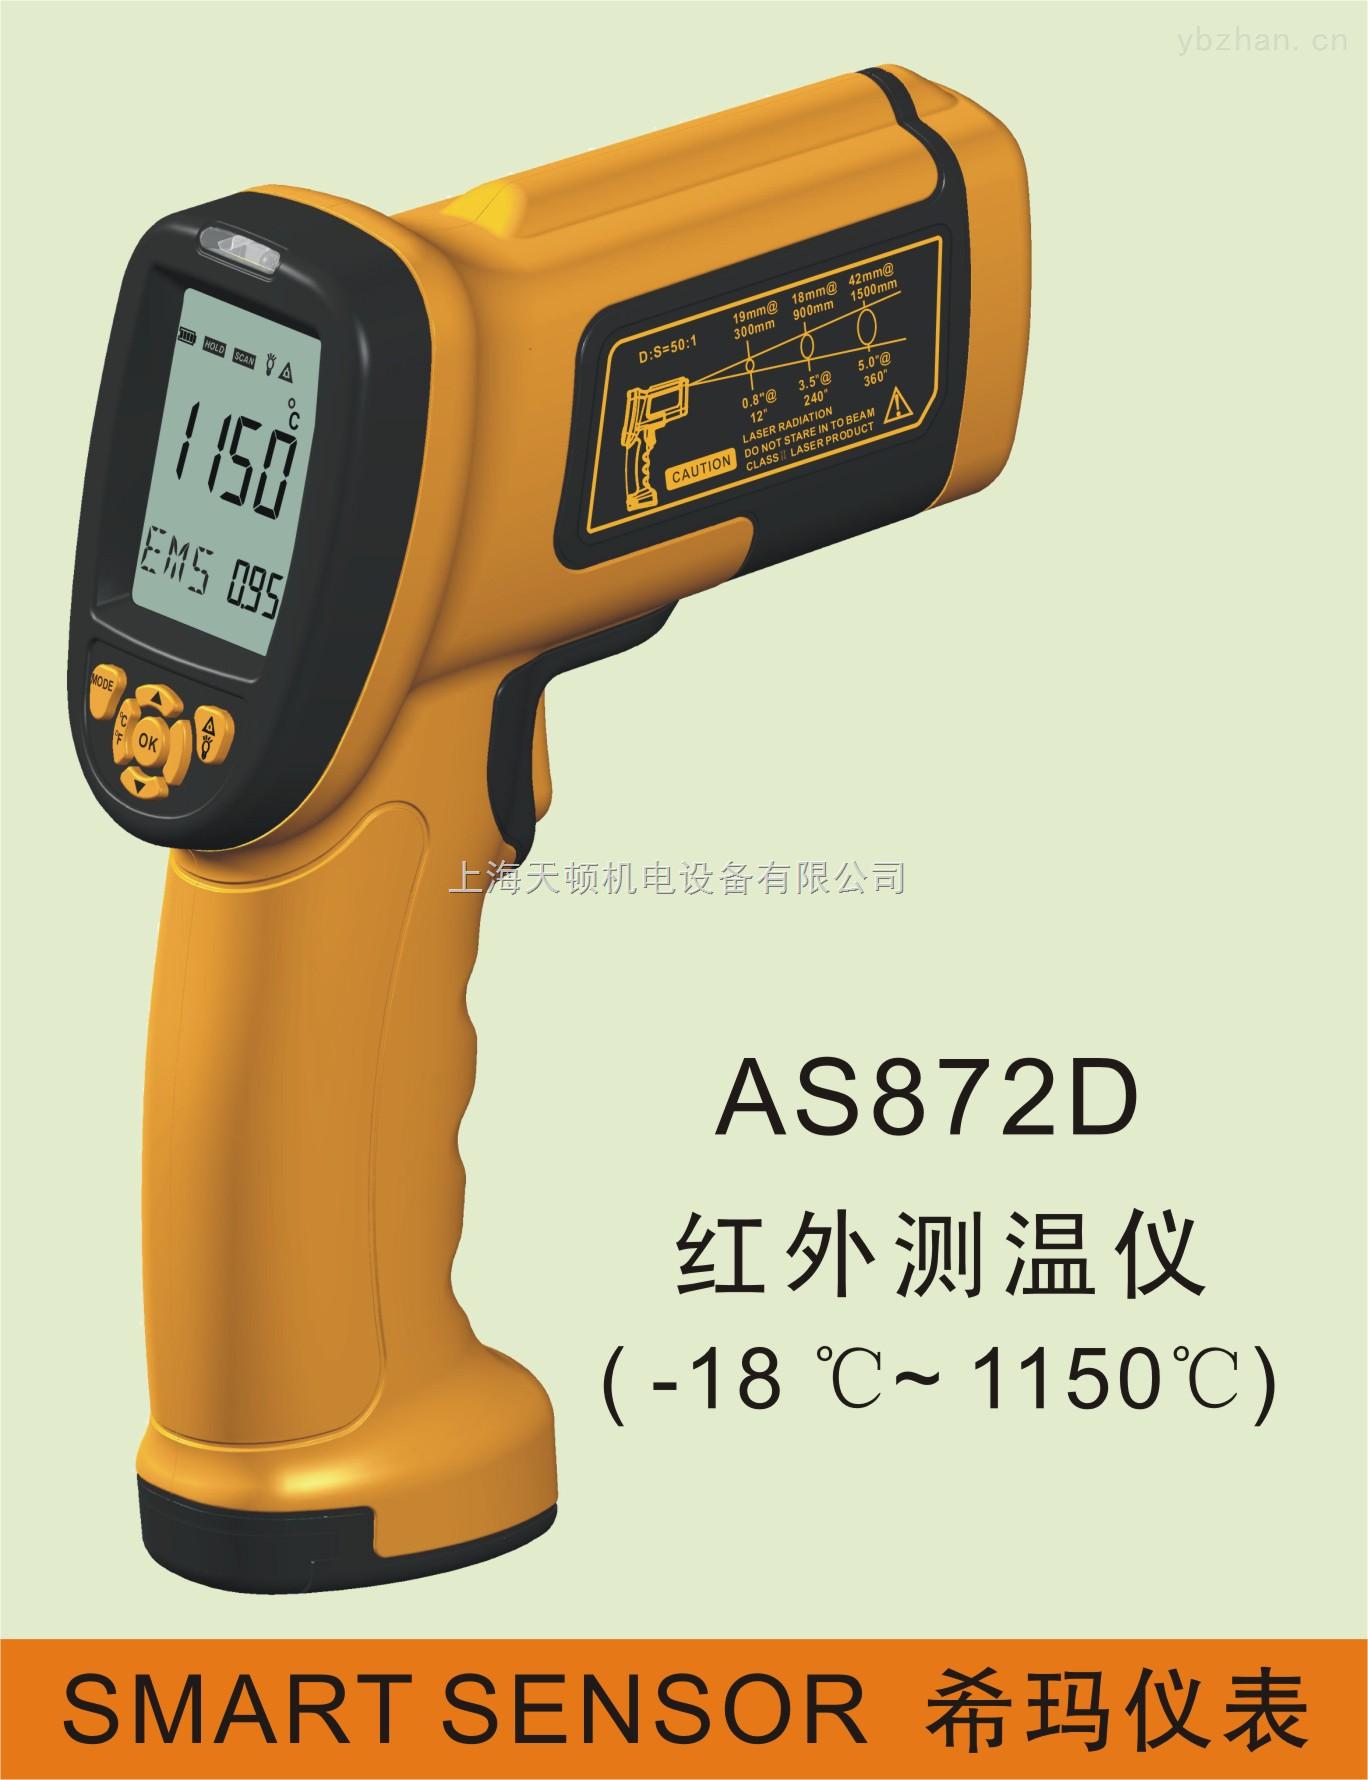 AS872D-原裝進口AS872D(-18℃~1150℃(-58℉~2102℉))高溫型紅外測溫儀